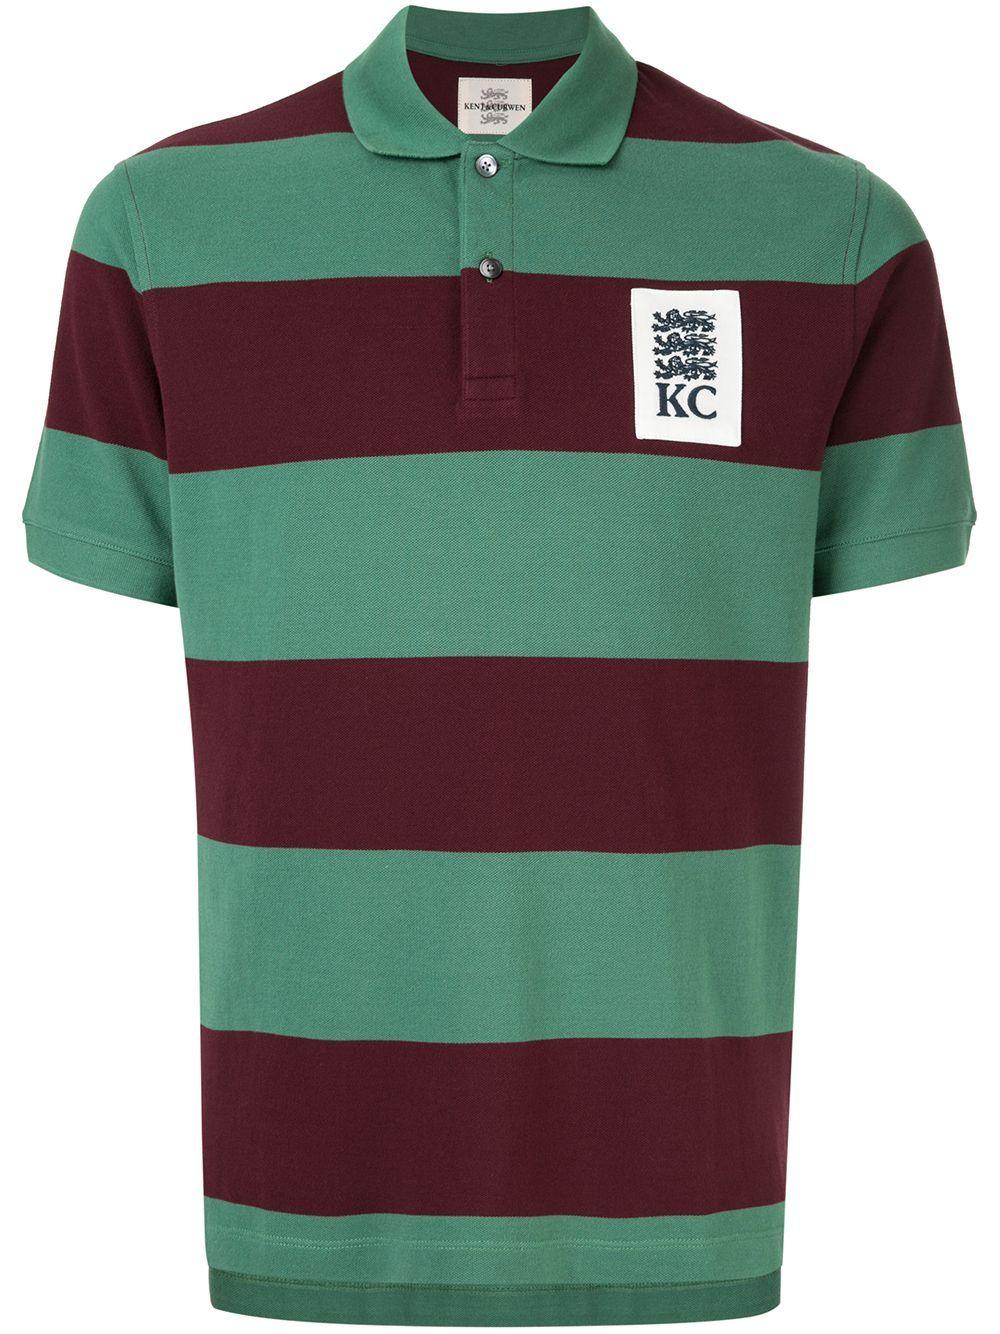 65d7ef438e2 KENT & CURWEN KENT & CURWEN STRIPED POLO SHIRT - GREEN. #kentcurwen #cloth